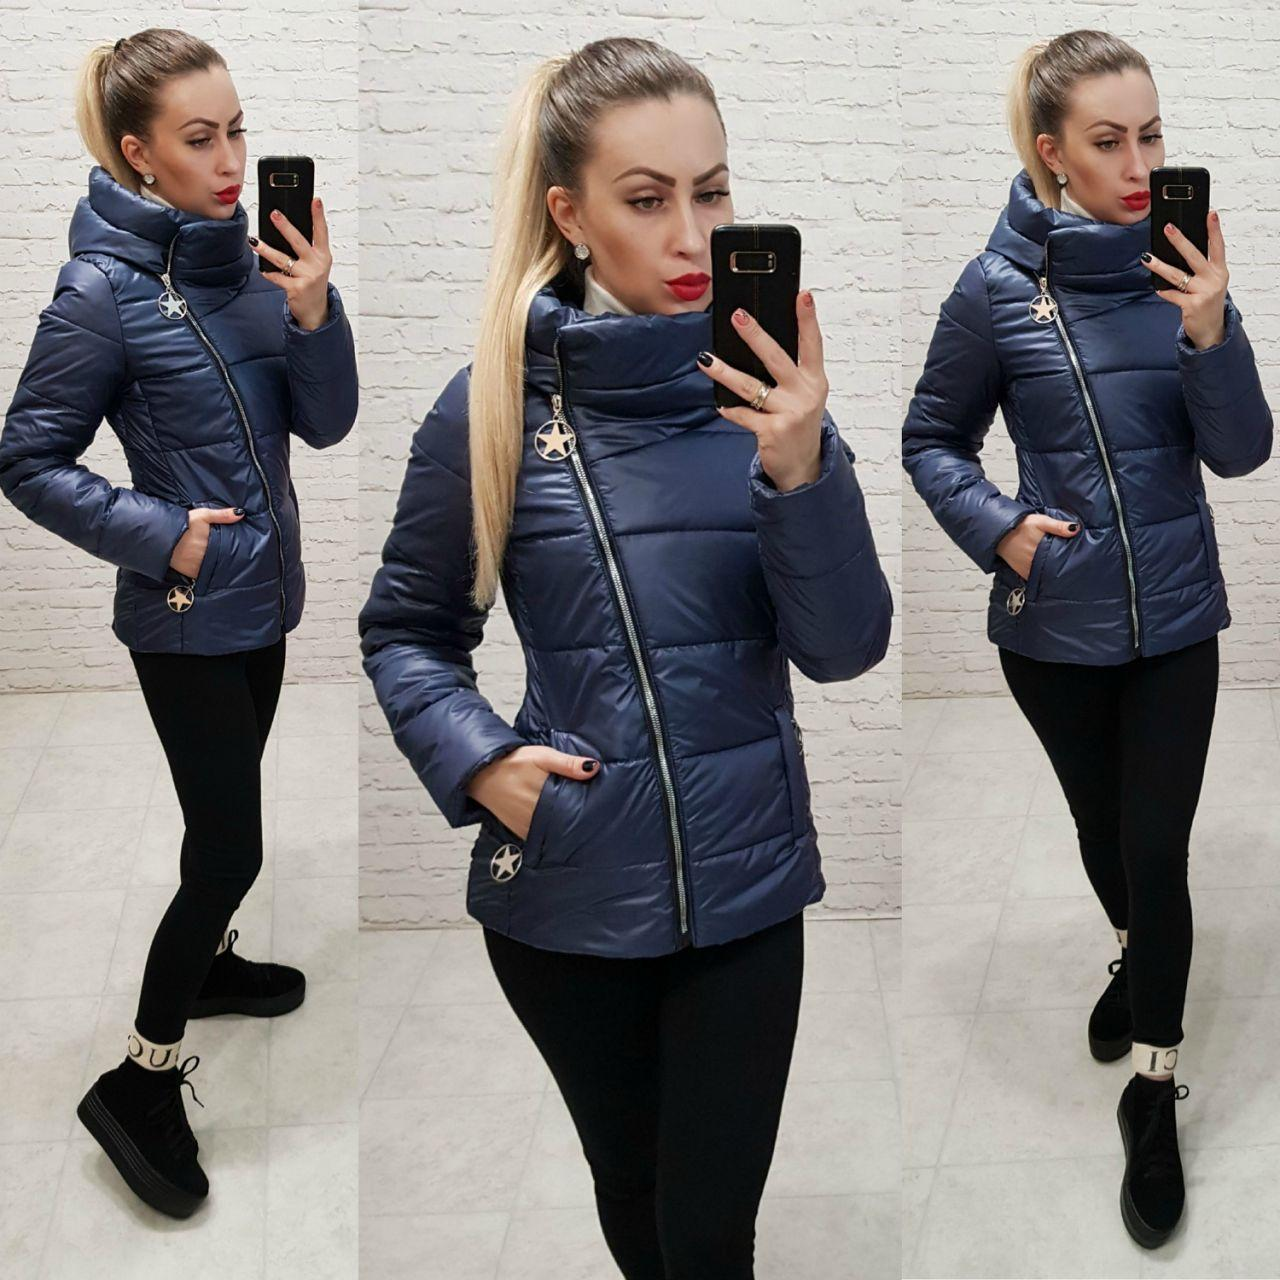 Демисезонная куртка 2019 ,арт. 501, цвет темно-синий